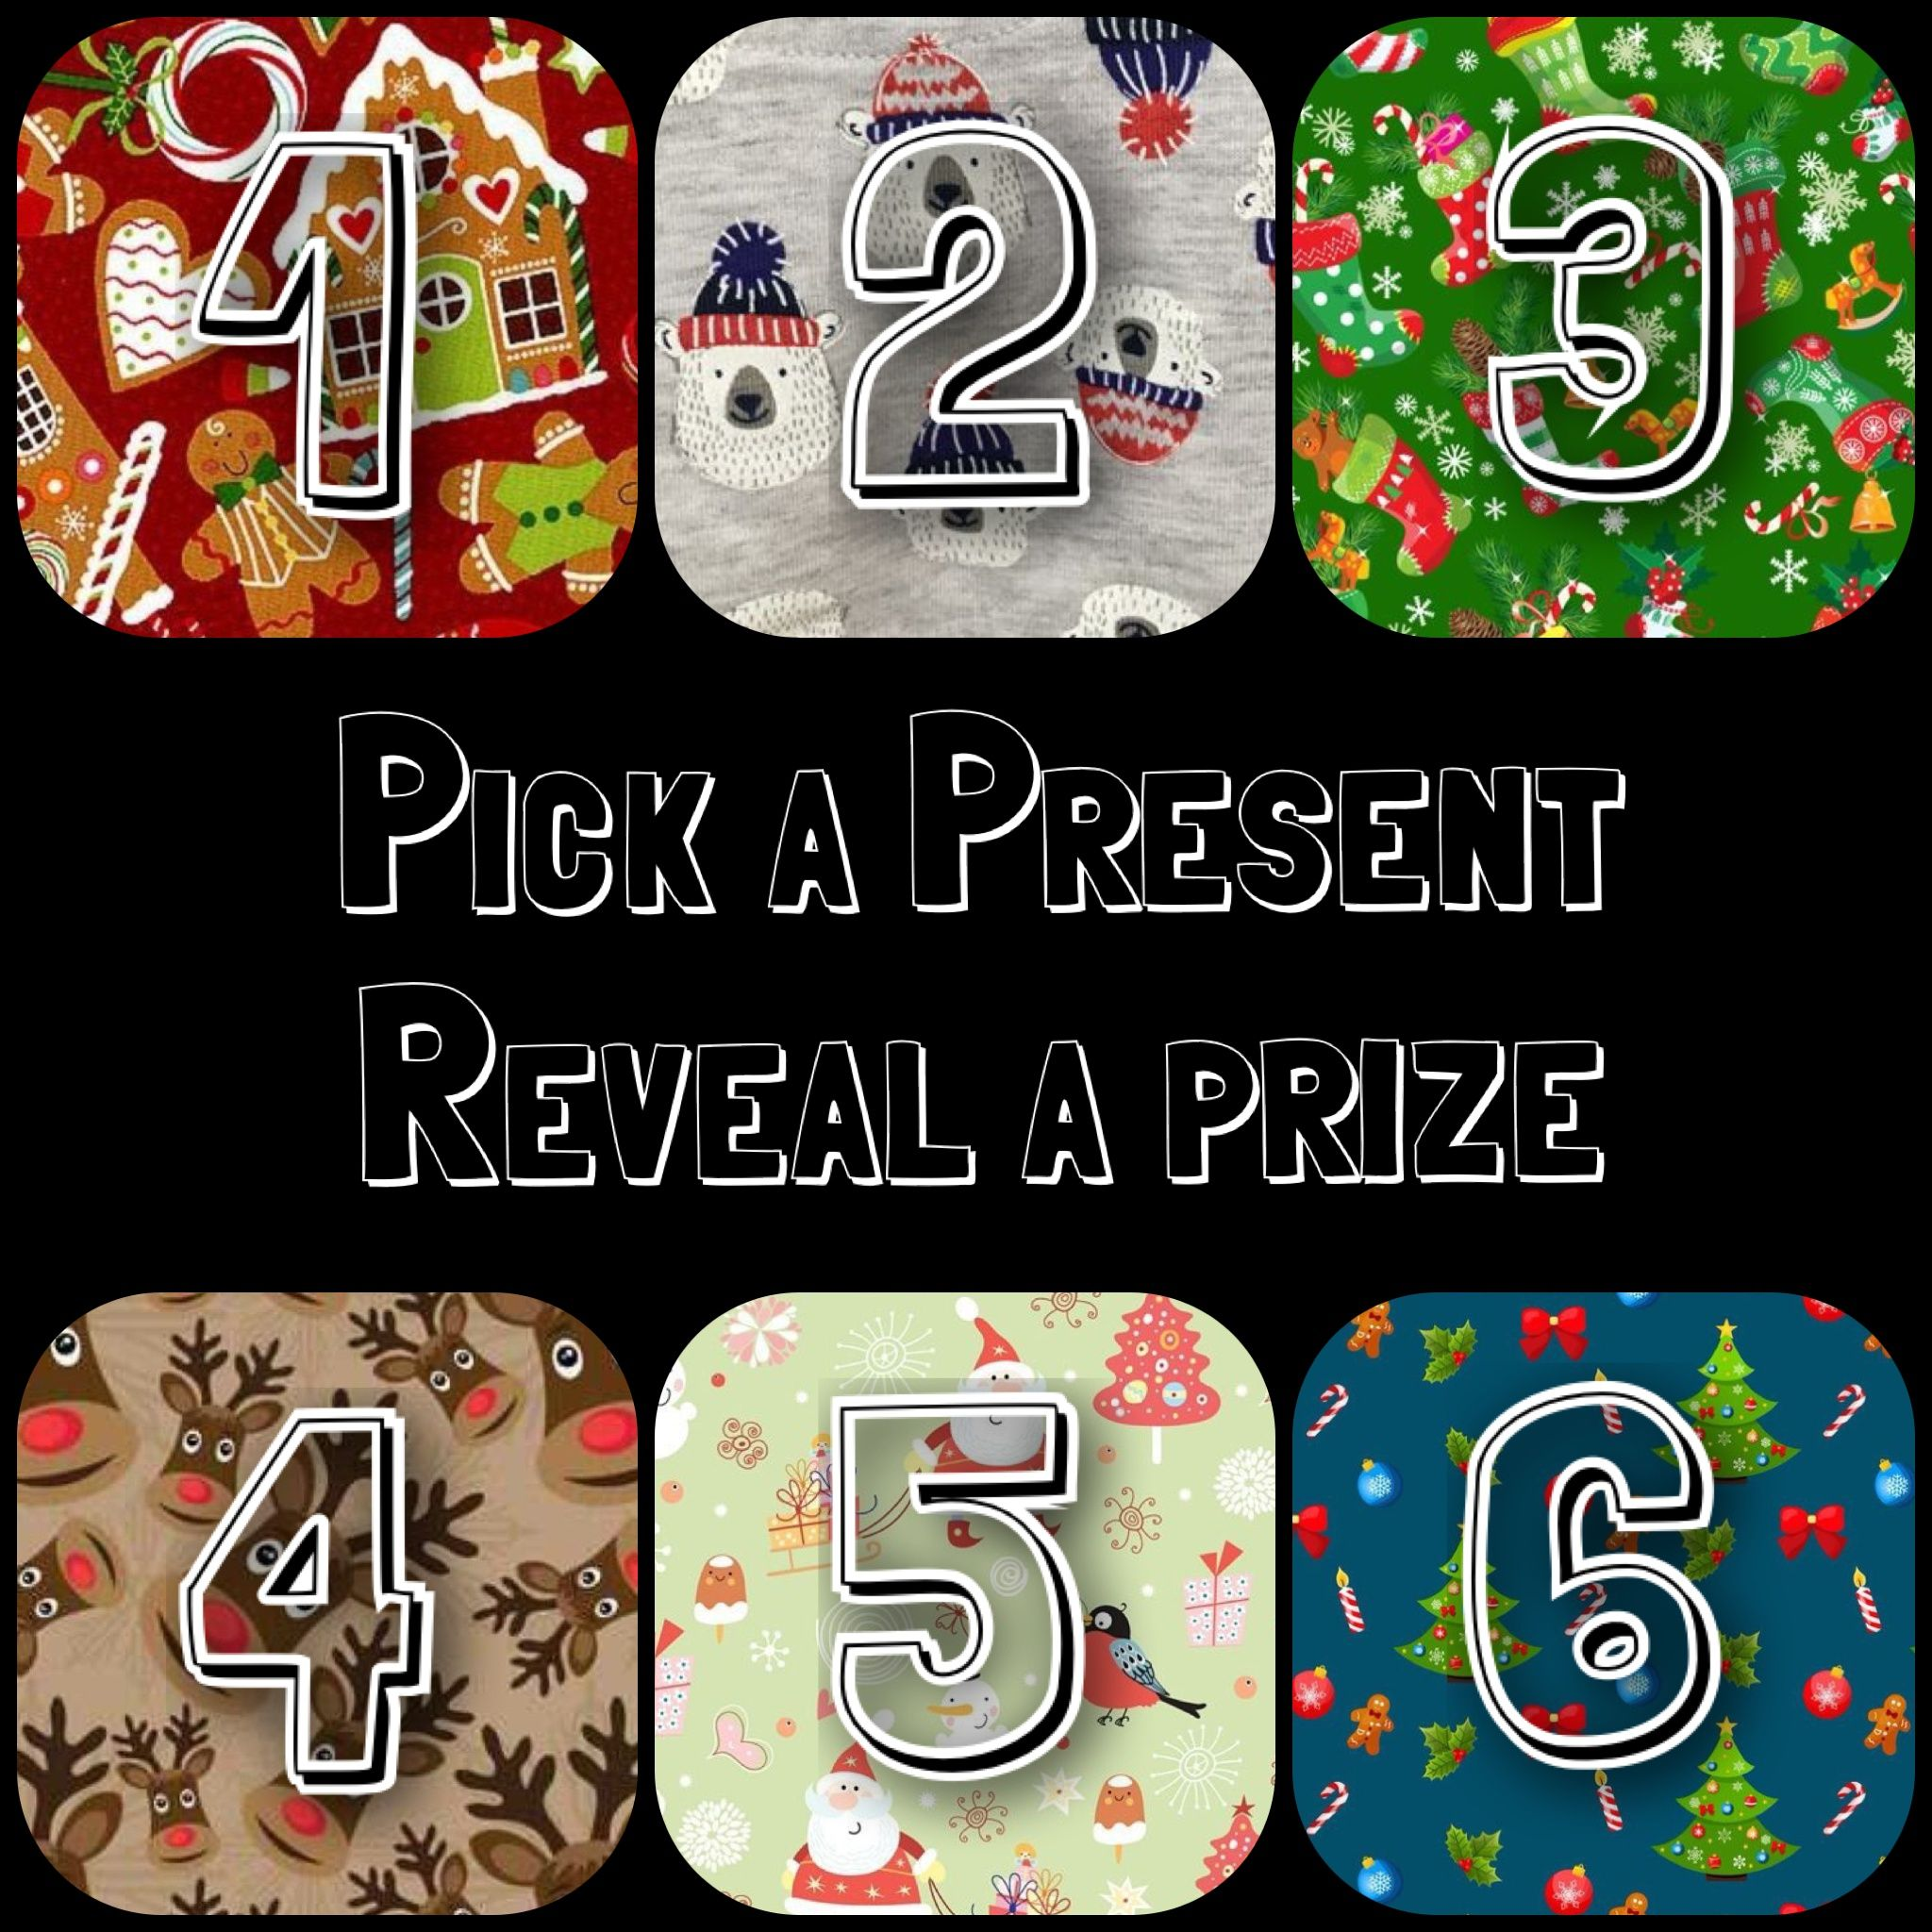 Pick a number Choose a present online Facebook game Raffle